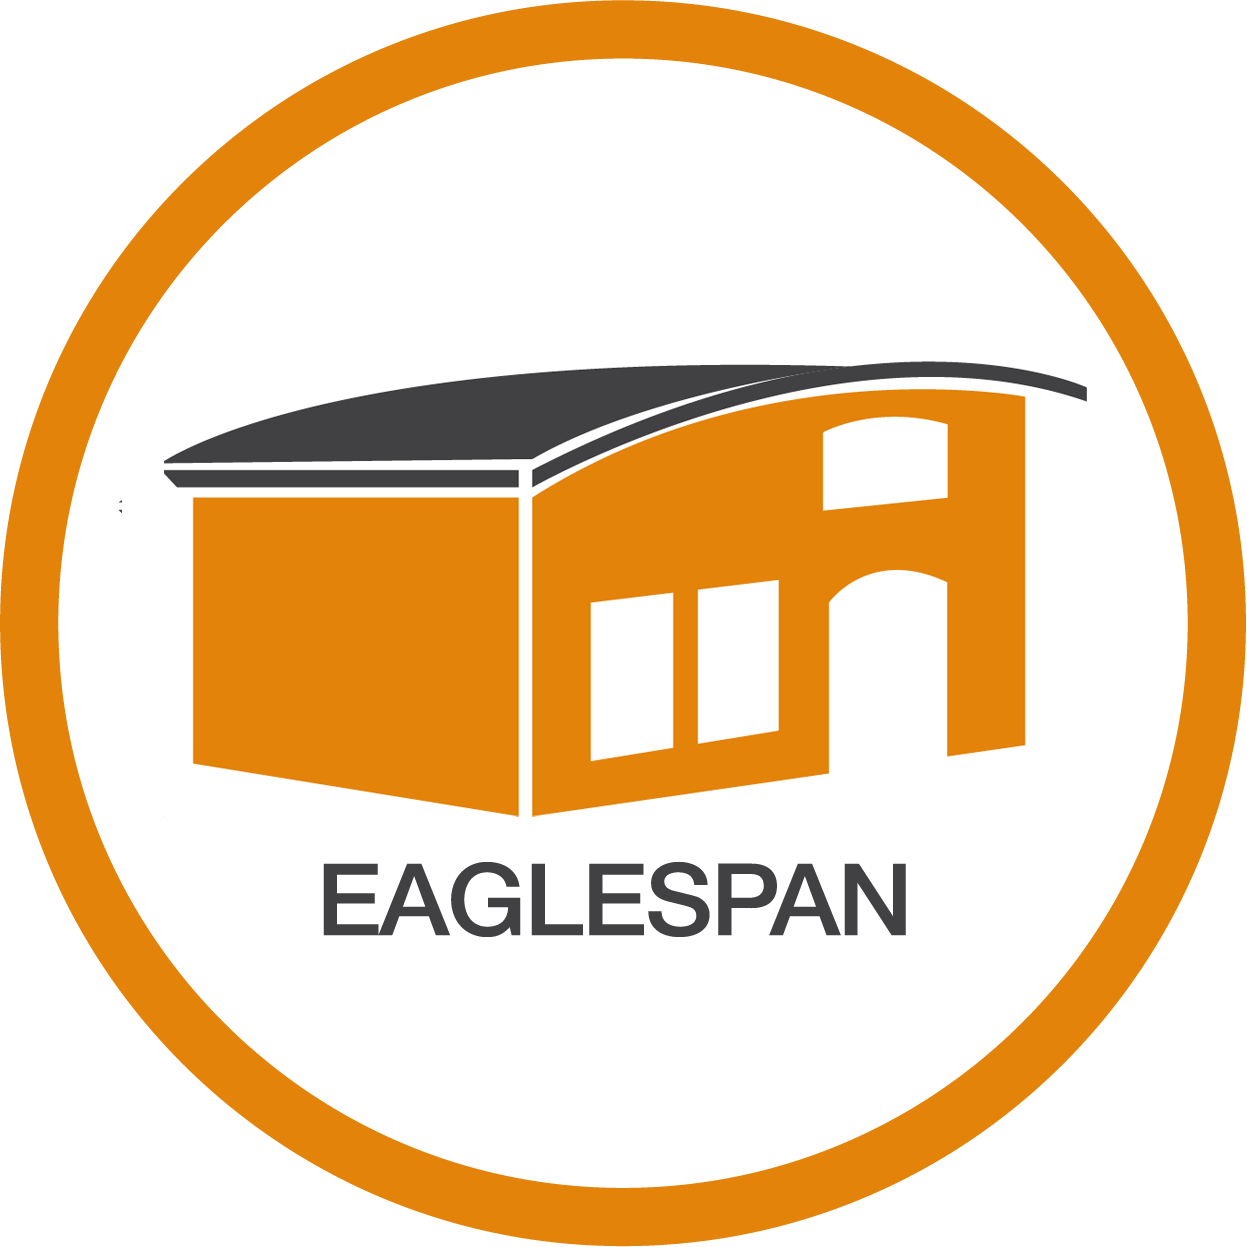 EagleSPAN